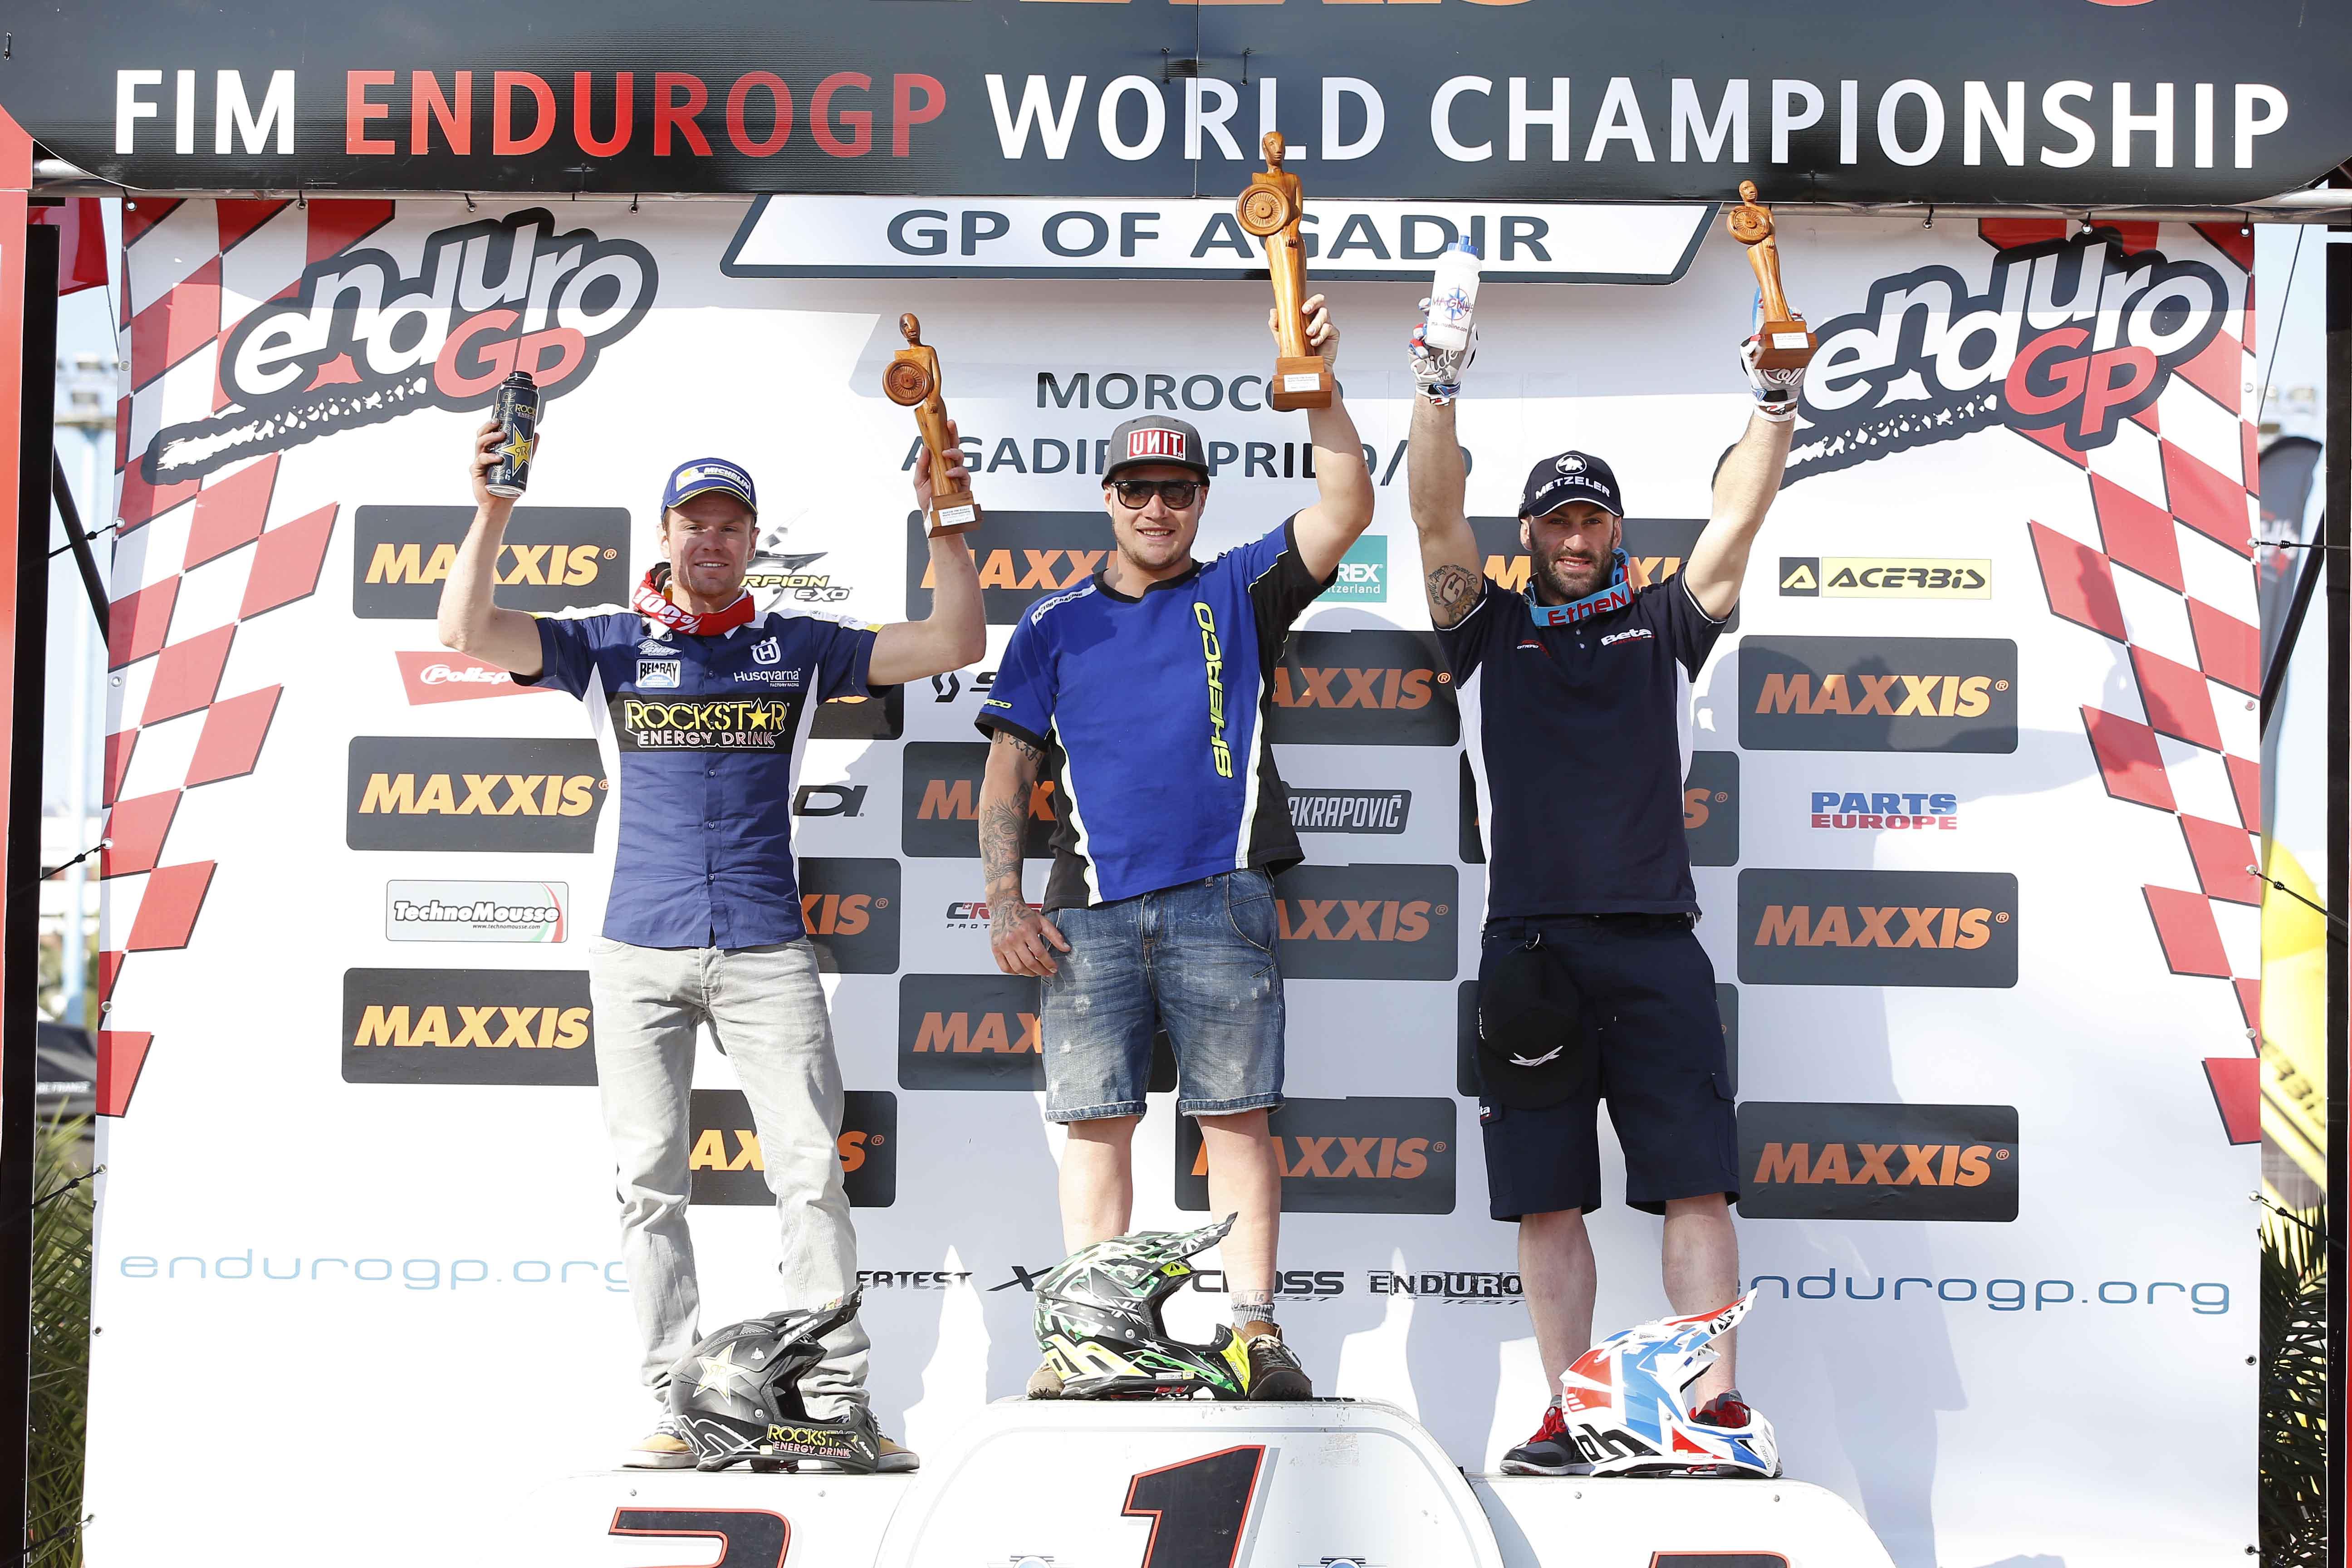 Beta World Enduro Championship 2016 - Marocco